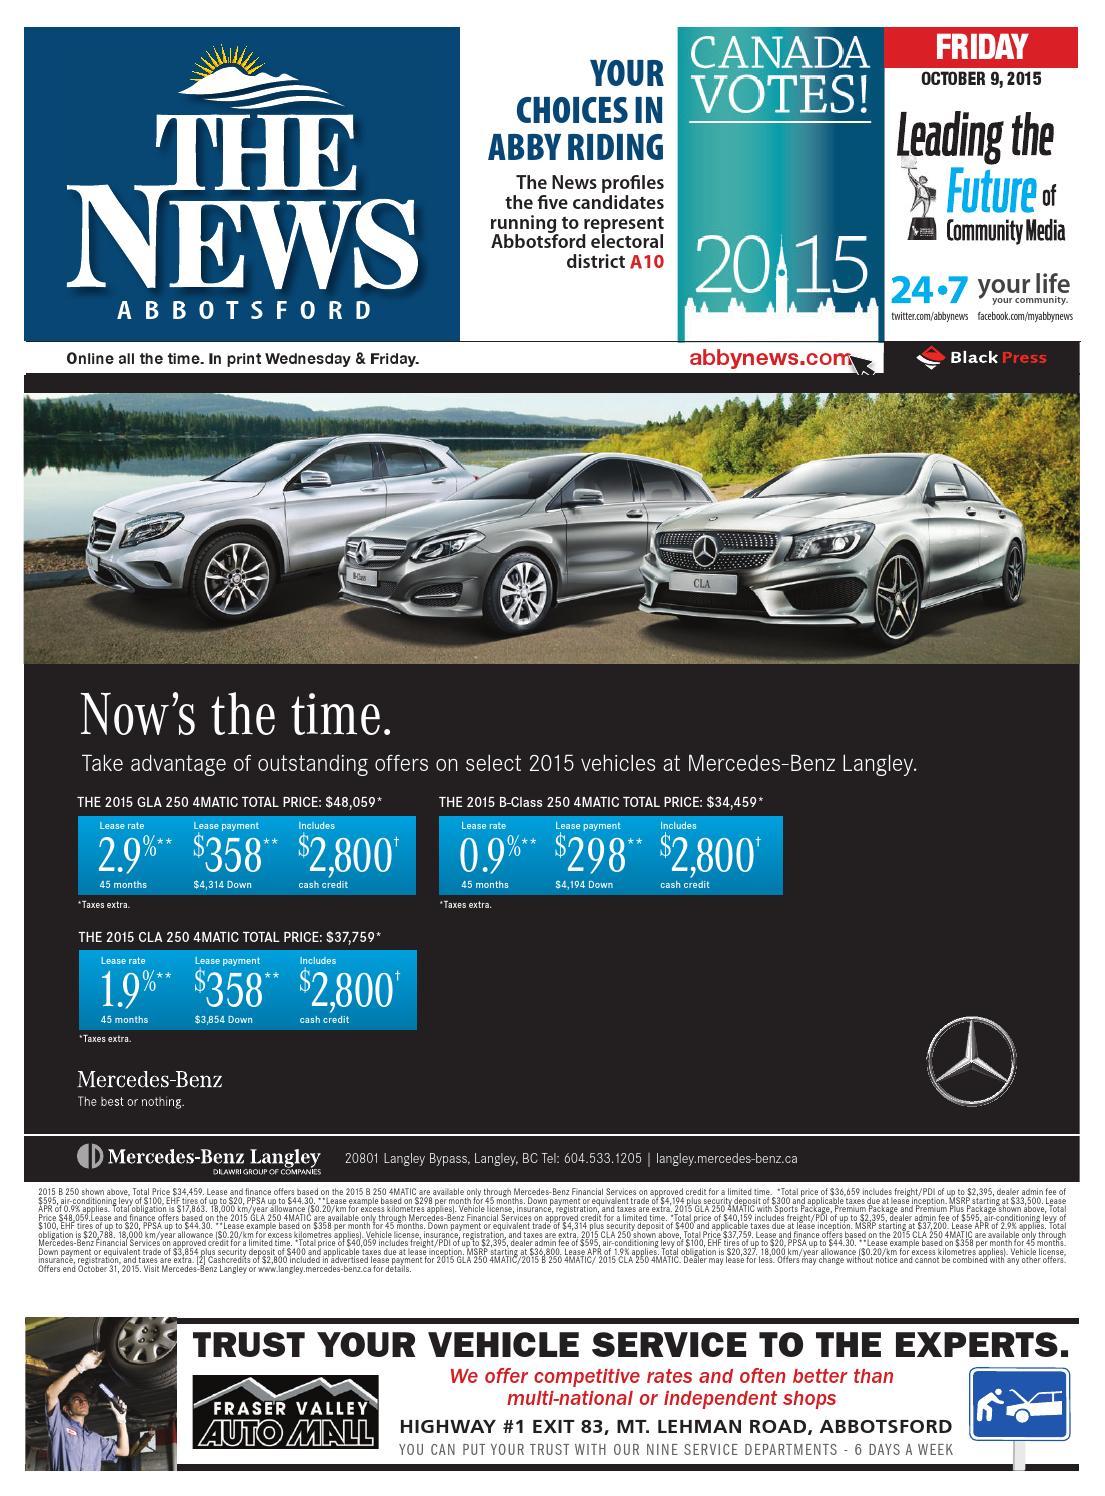 Abbotsford News October 09 2015 By Black Press